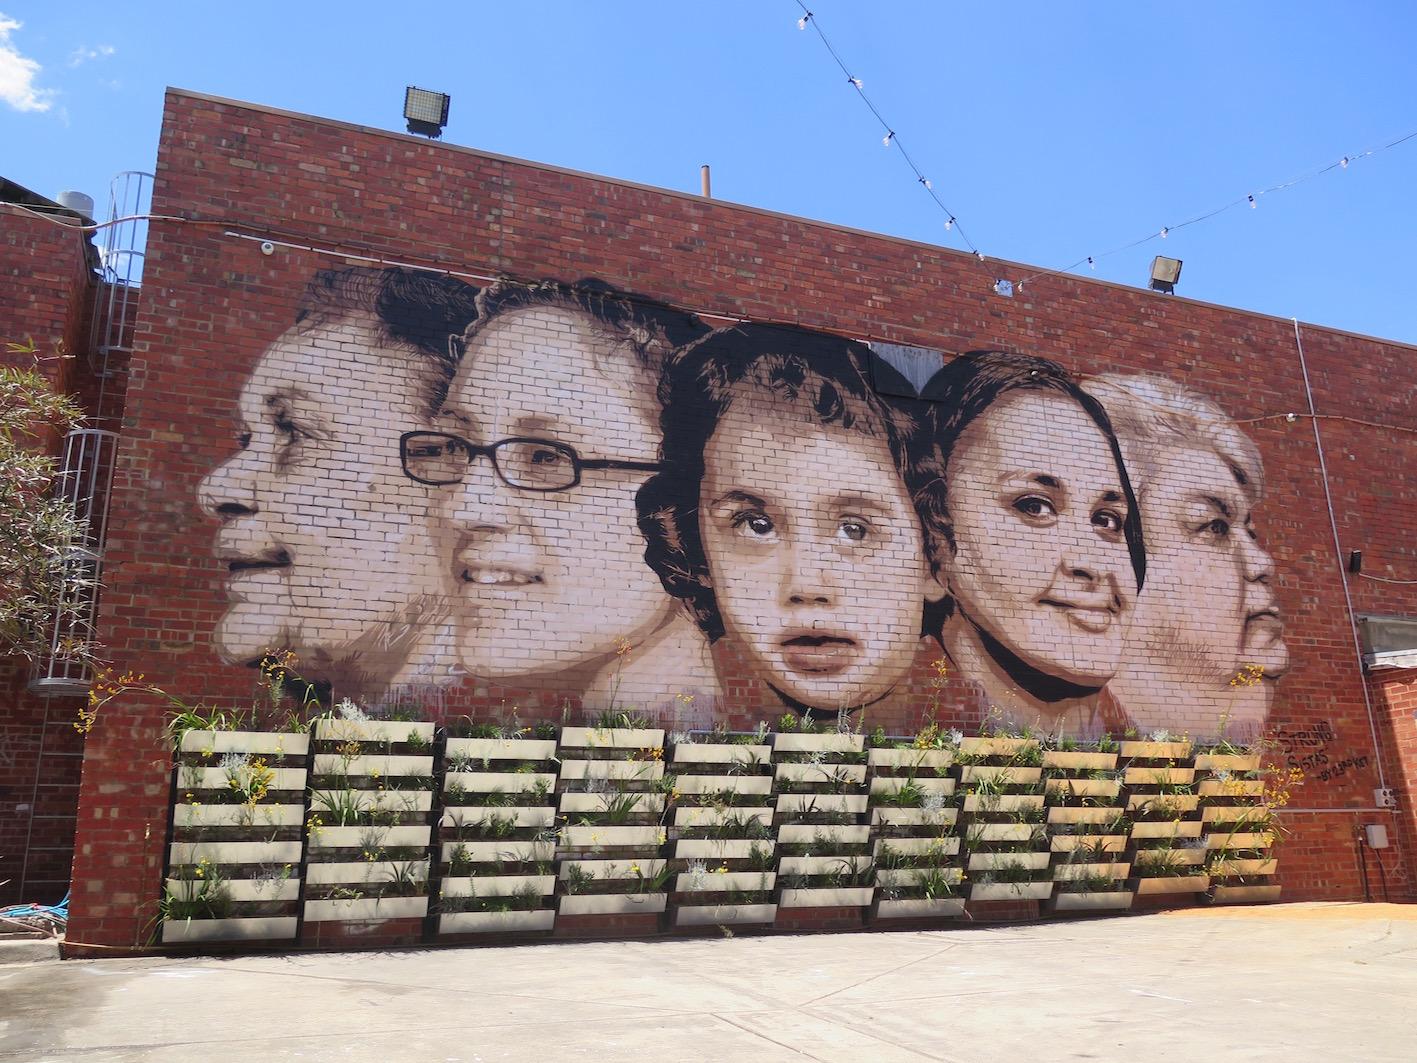 deansunshine_landofsunshine_melbourne_streetart_graffiti_eastland urban art project 1 23rd key 1